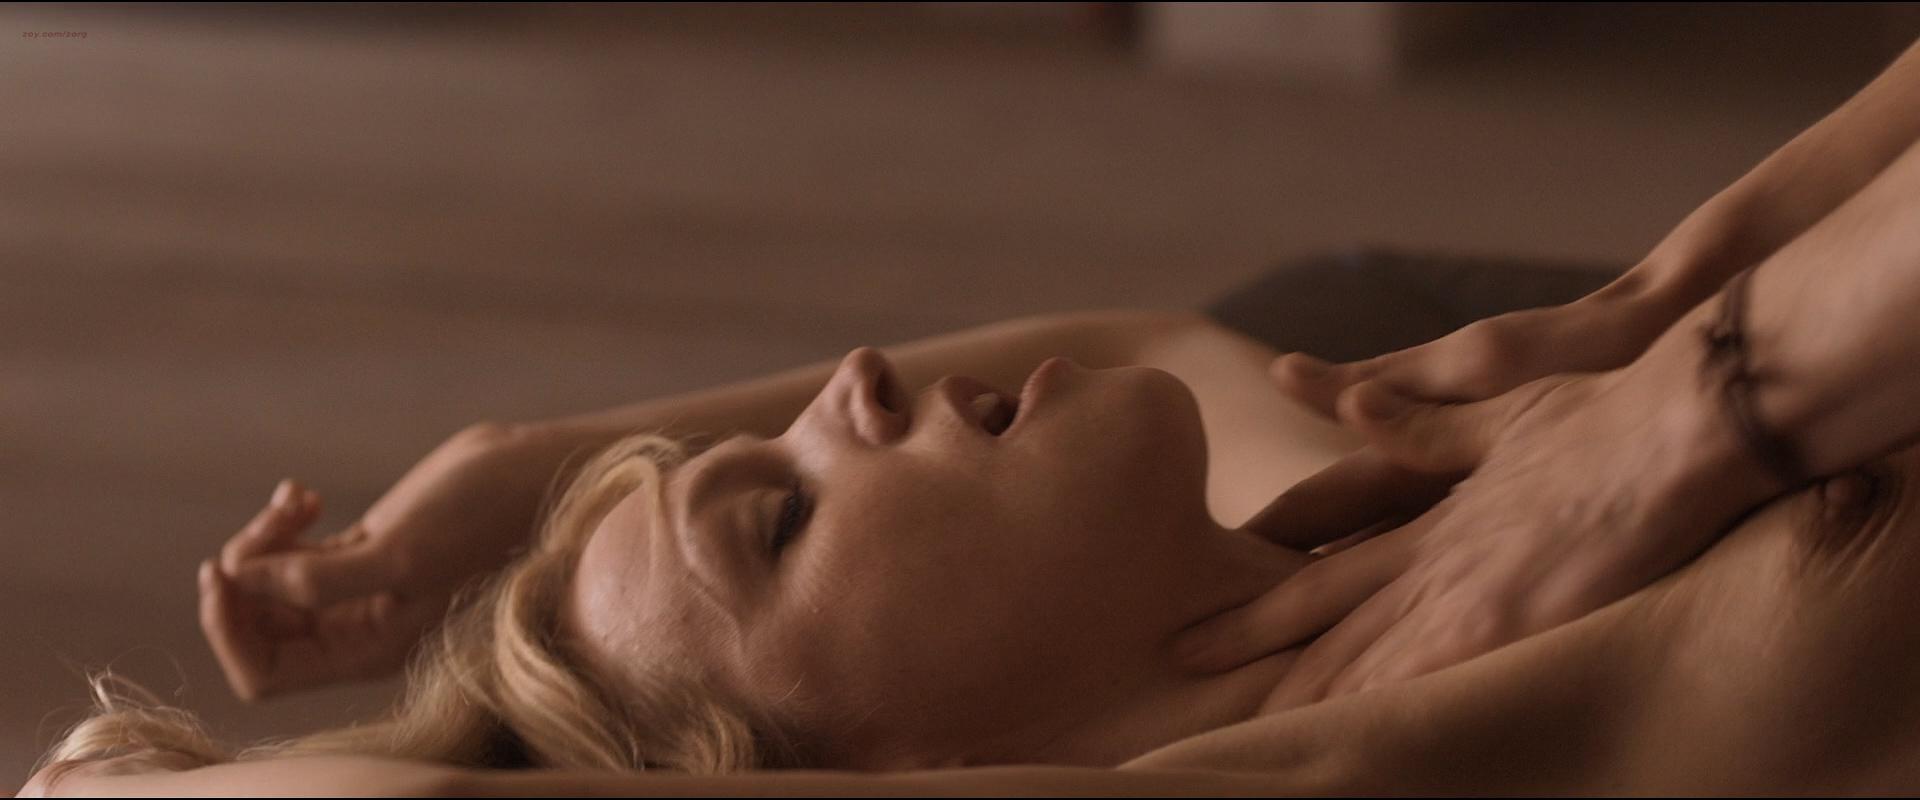 Loes Haverkort nude hot sex - Rendez-Vous (NL-2015) HD 1080p BluRay (3)